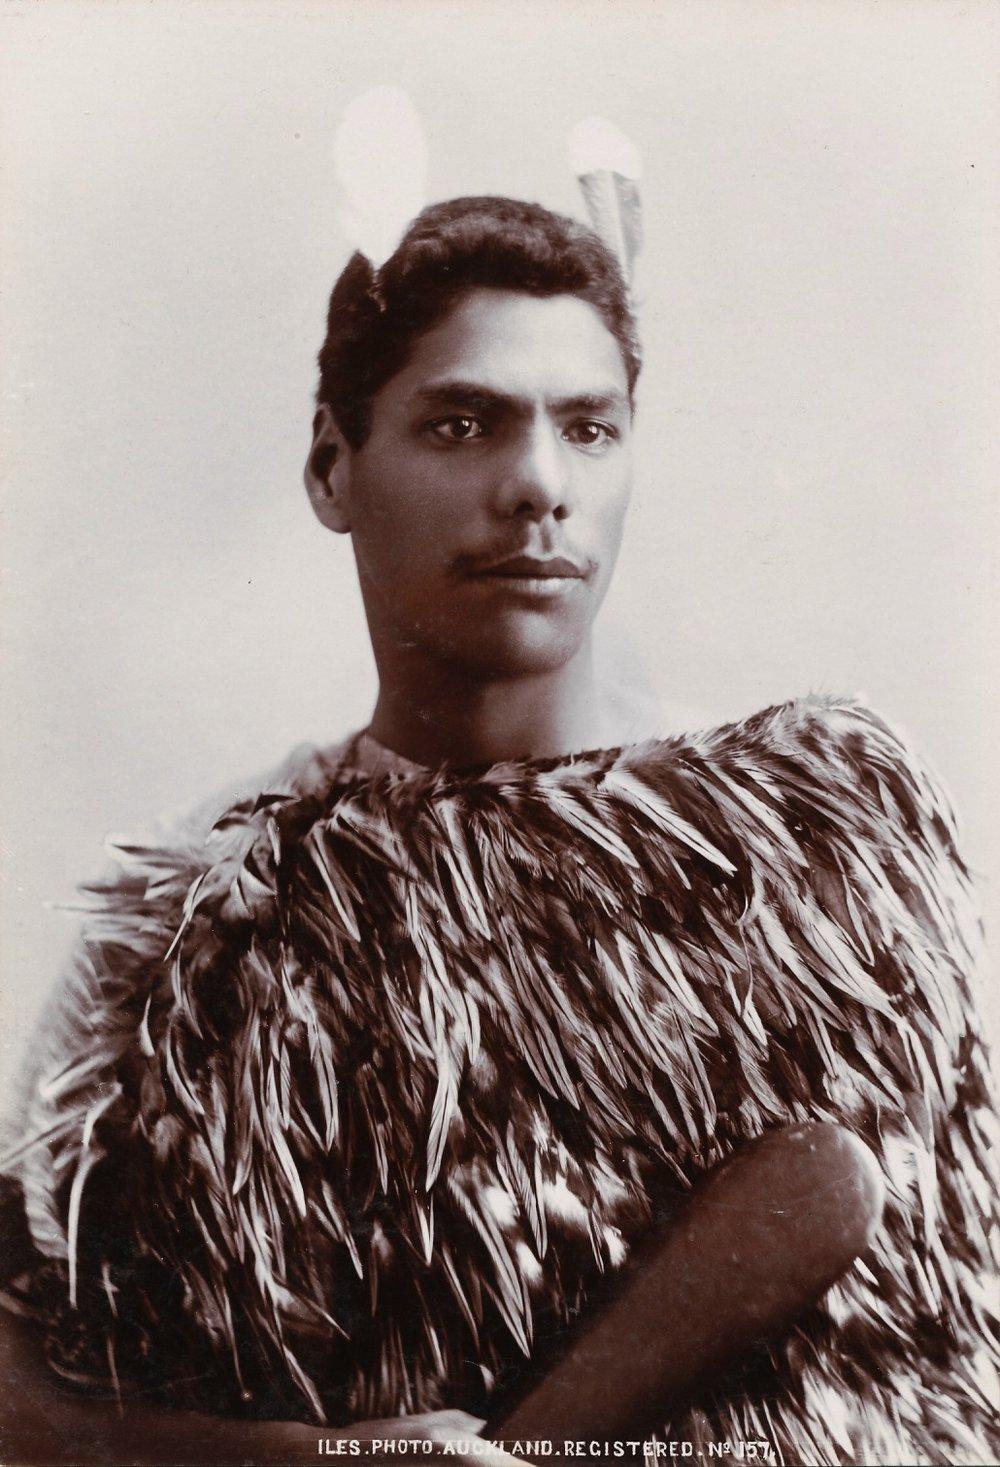 Iles: Maori with Patu. New Zealand, c.1895. Silver Gelatin Silver Print, 19.5 X 13.5 cm.